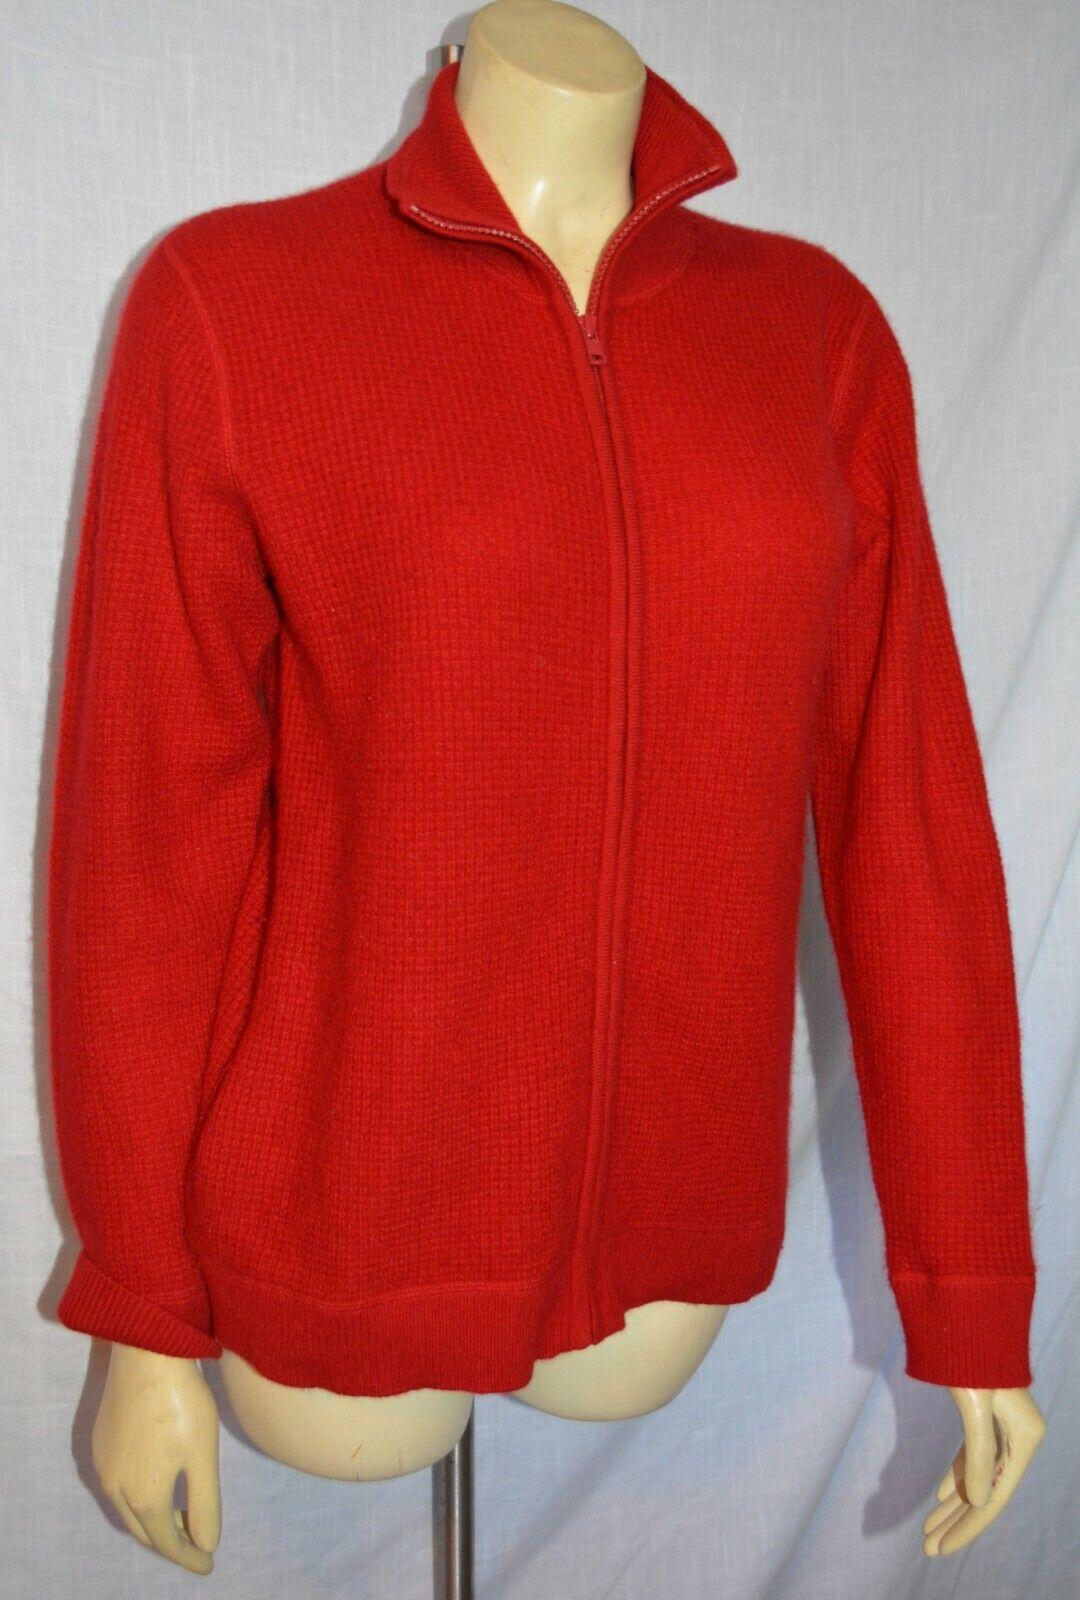 Gorgeous Neiherren Marcus Bre Cashmere Zip Up autodigan Sweater stunning rot S